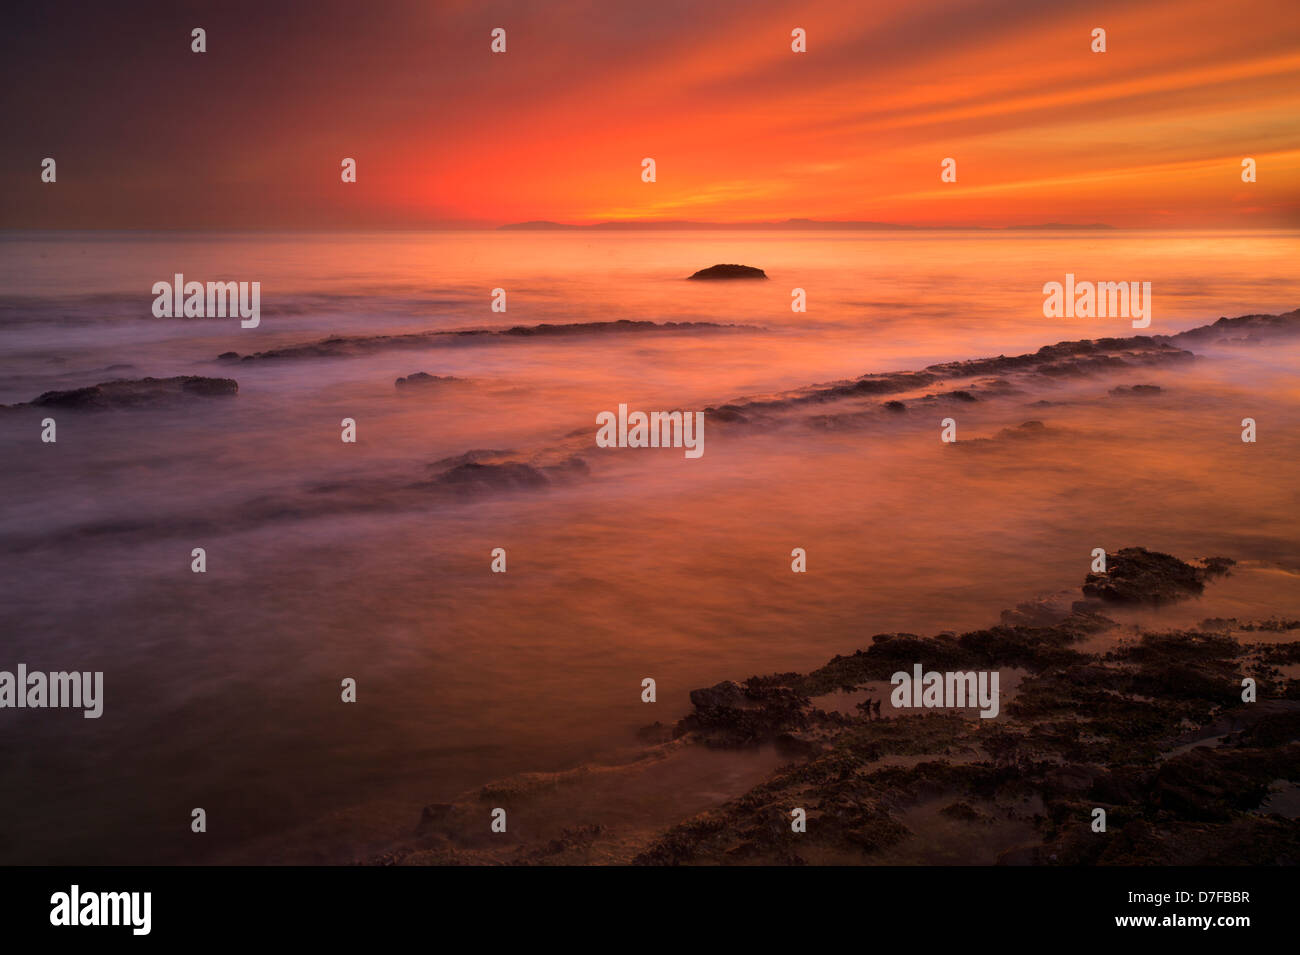 Coucher du soleil à Crystal Cove State Park, Newport Beach, Orange County, en Californie. Photo Stock